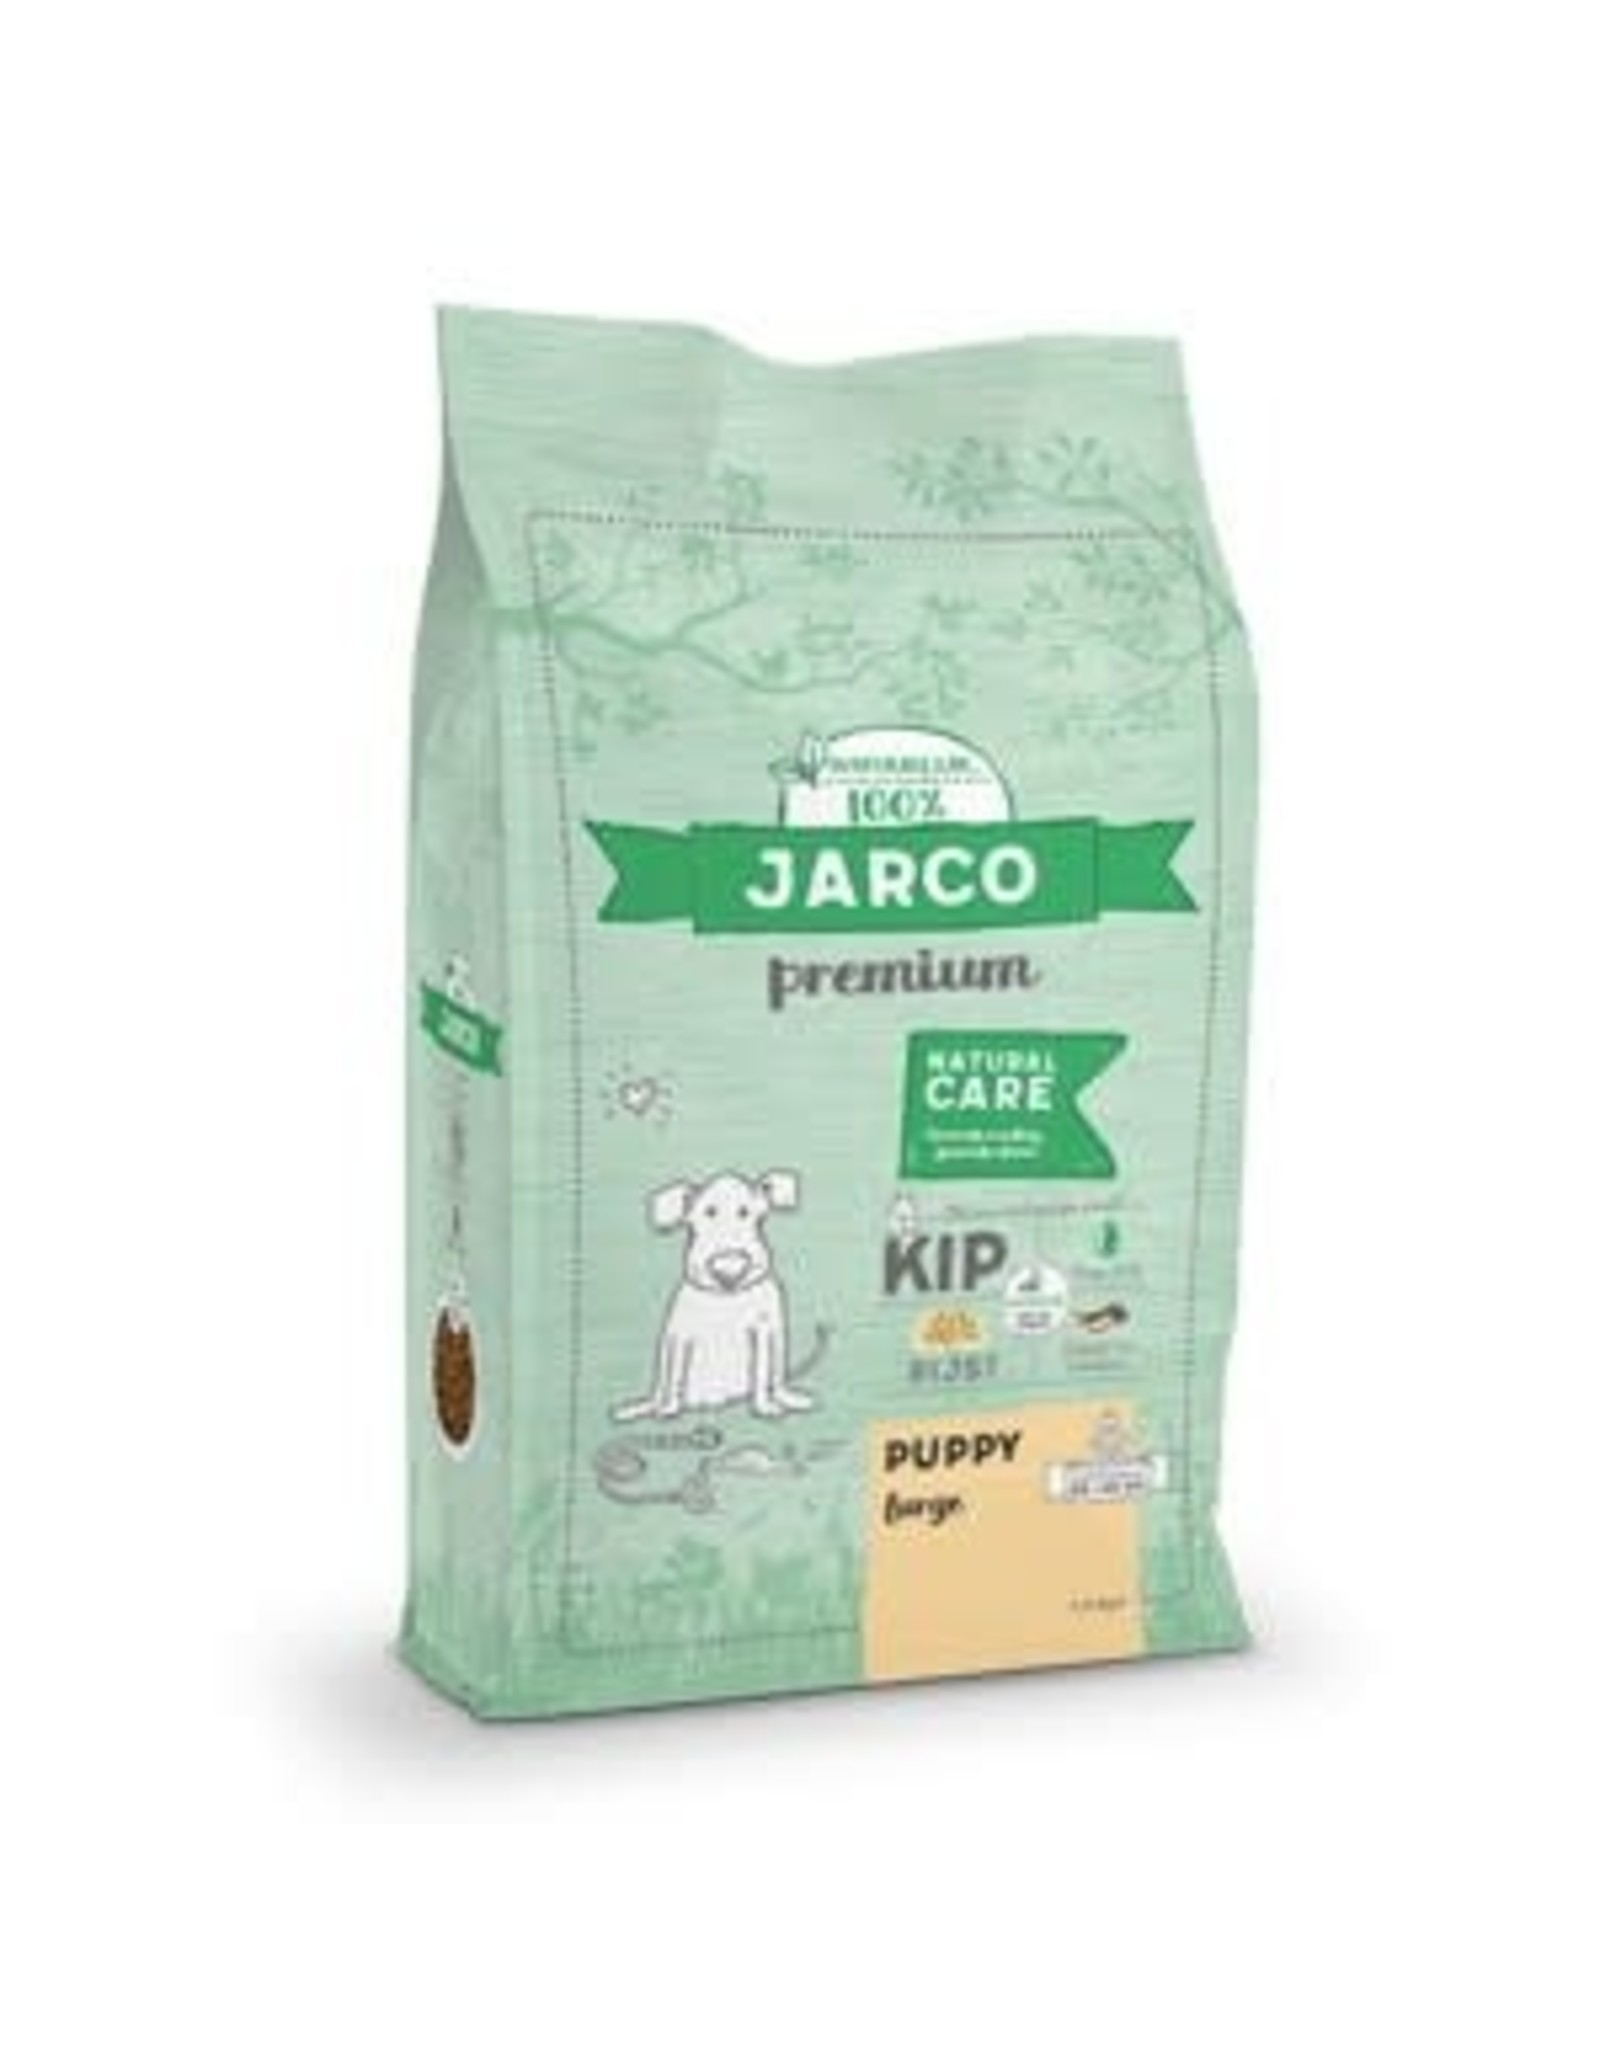 Jarco Large Puppy 26-45 Kg - Kip - 2,5Kg